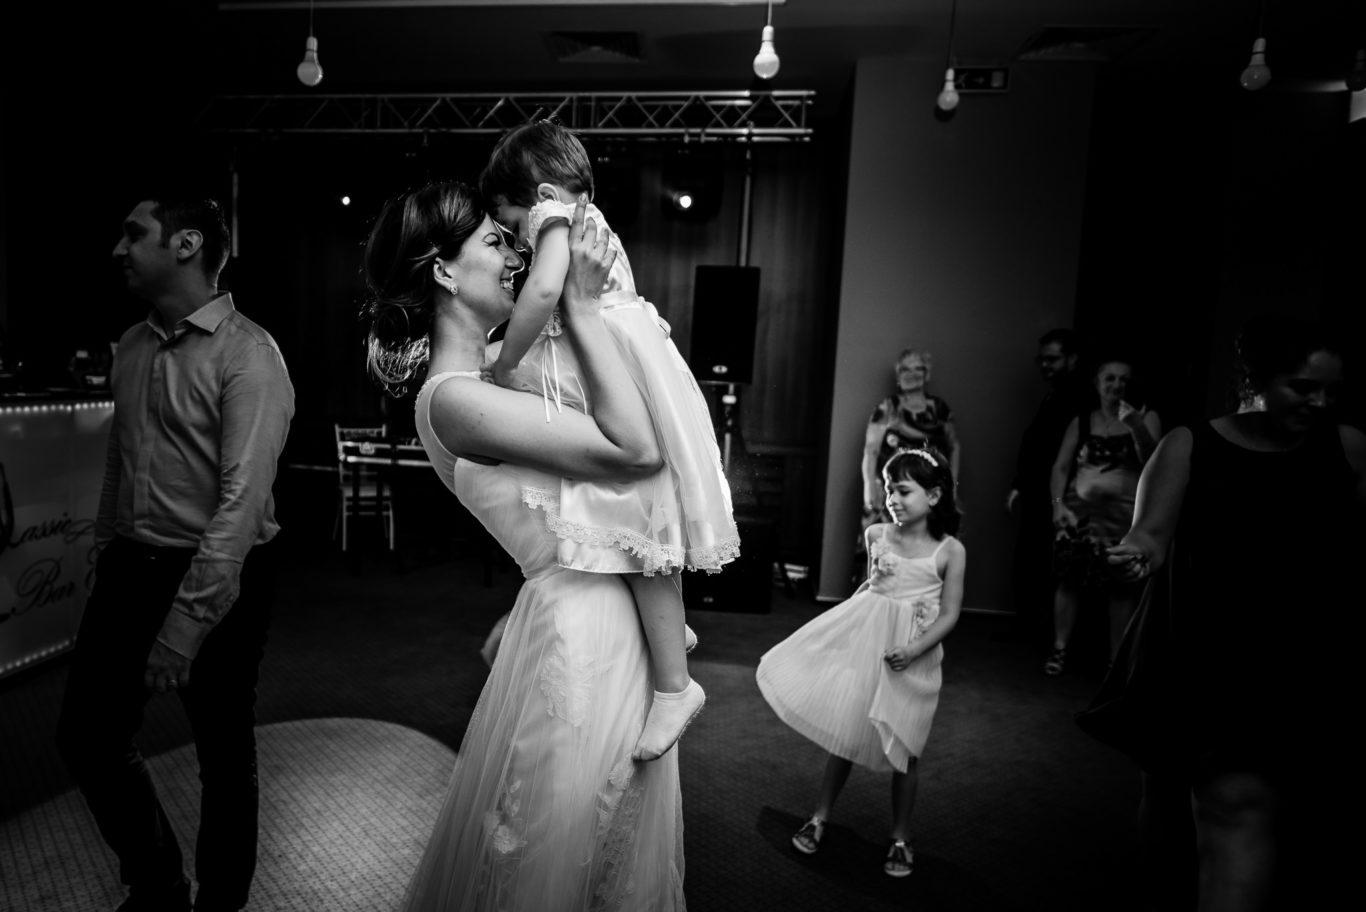 0735-Fotografie-nunta-Bucuresti-Oana-Catalin-fotograf-Ciprian-Dumitrescu-DSC_5172